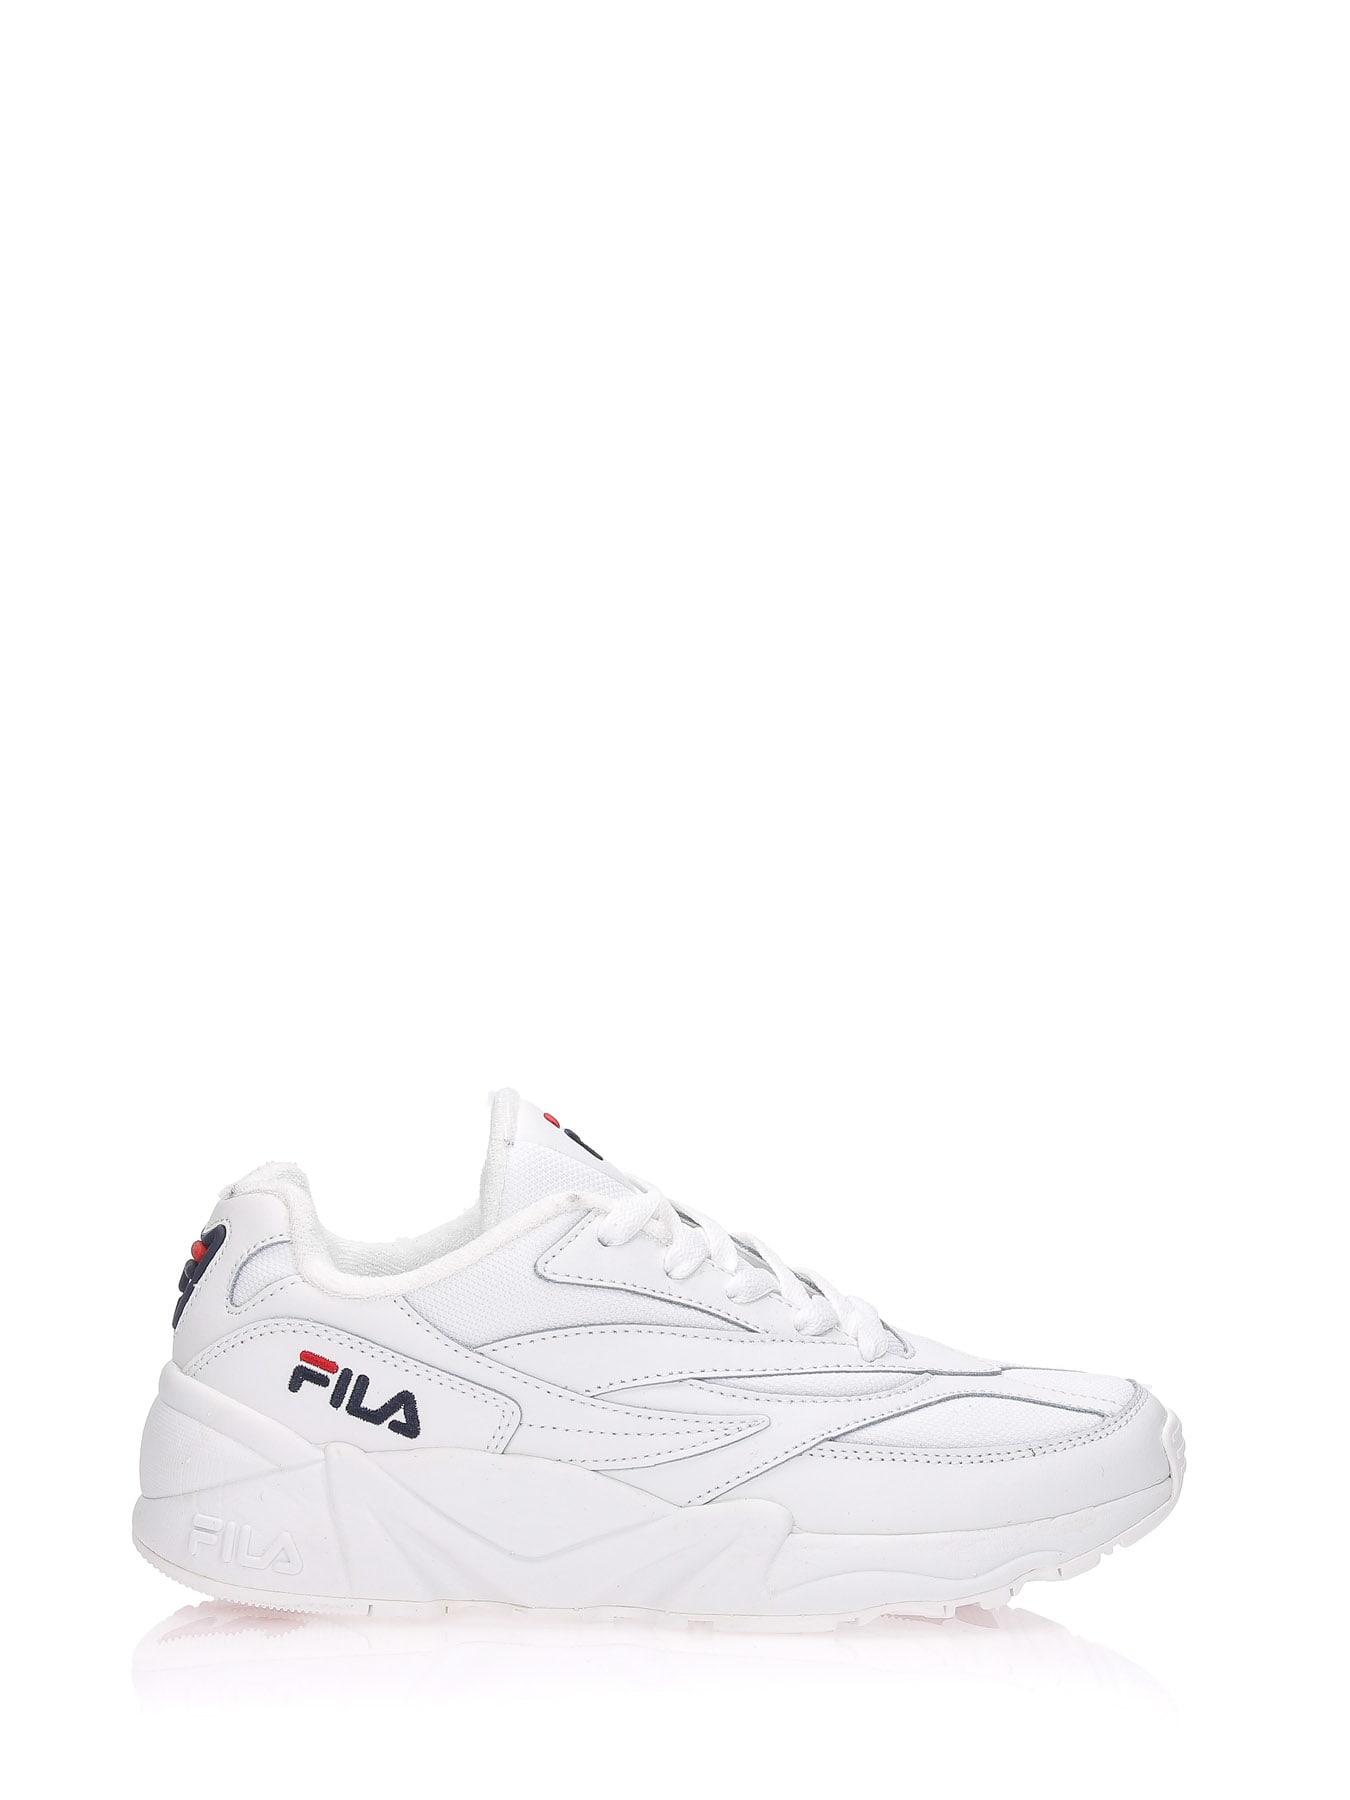 f9a0e1e5 Fila Sneakers V94m Low Wmn